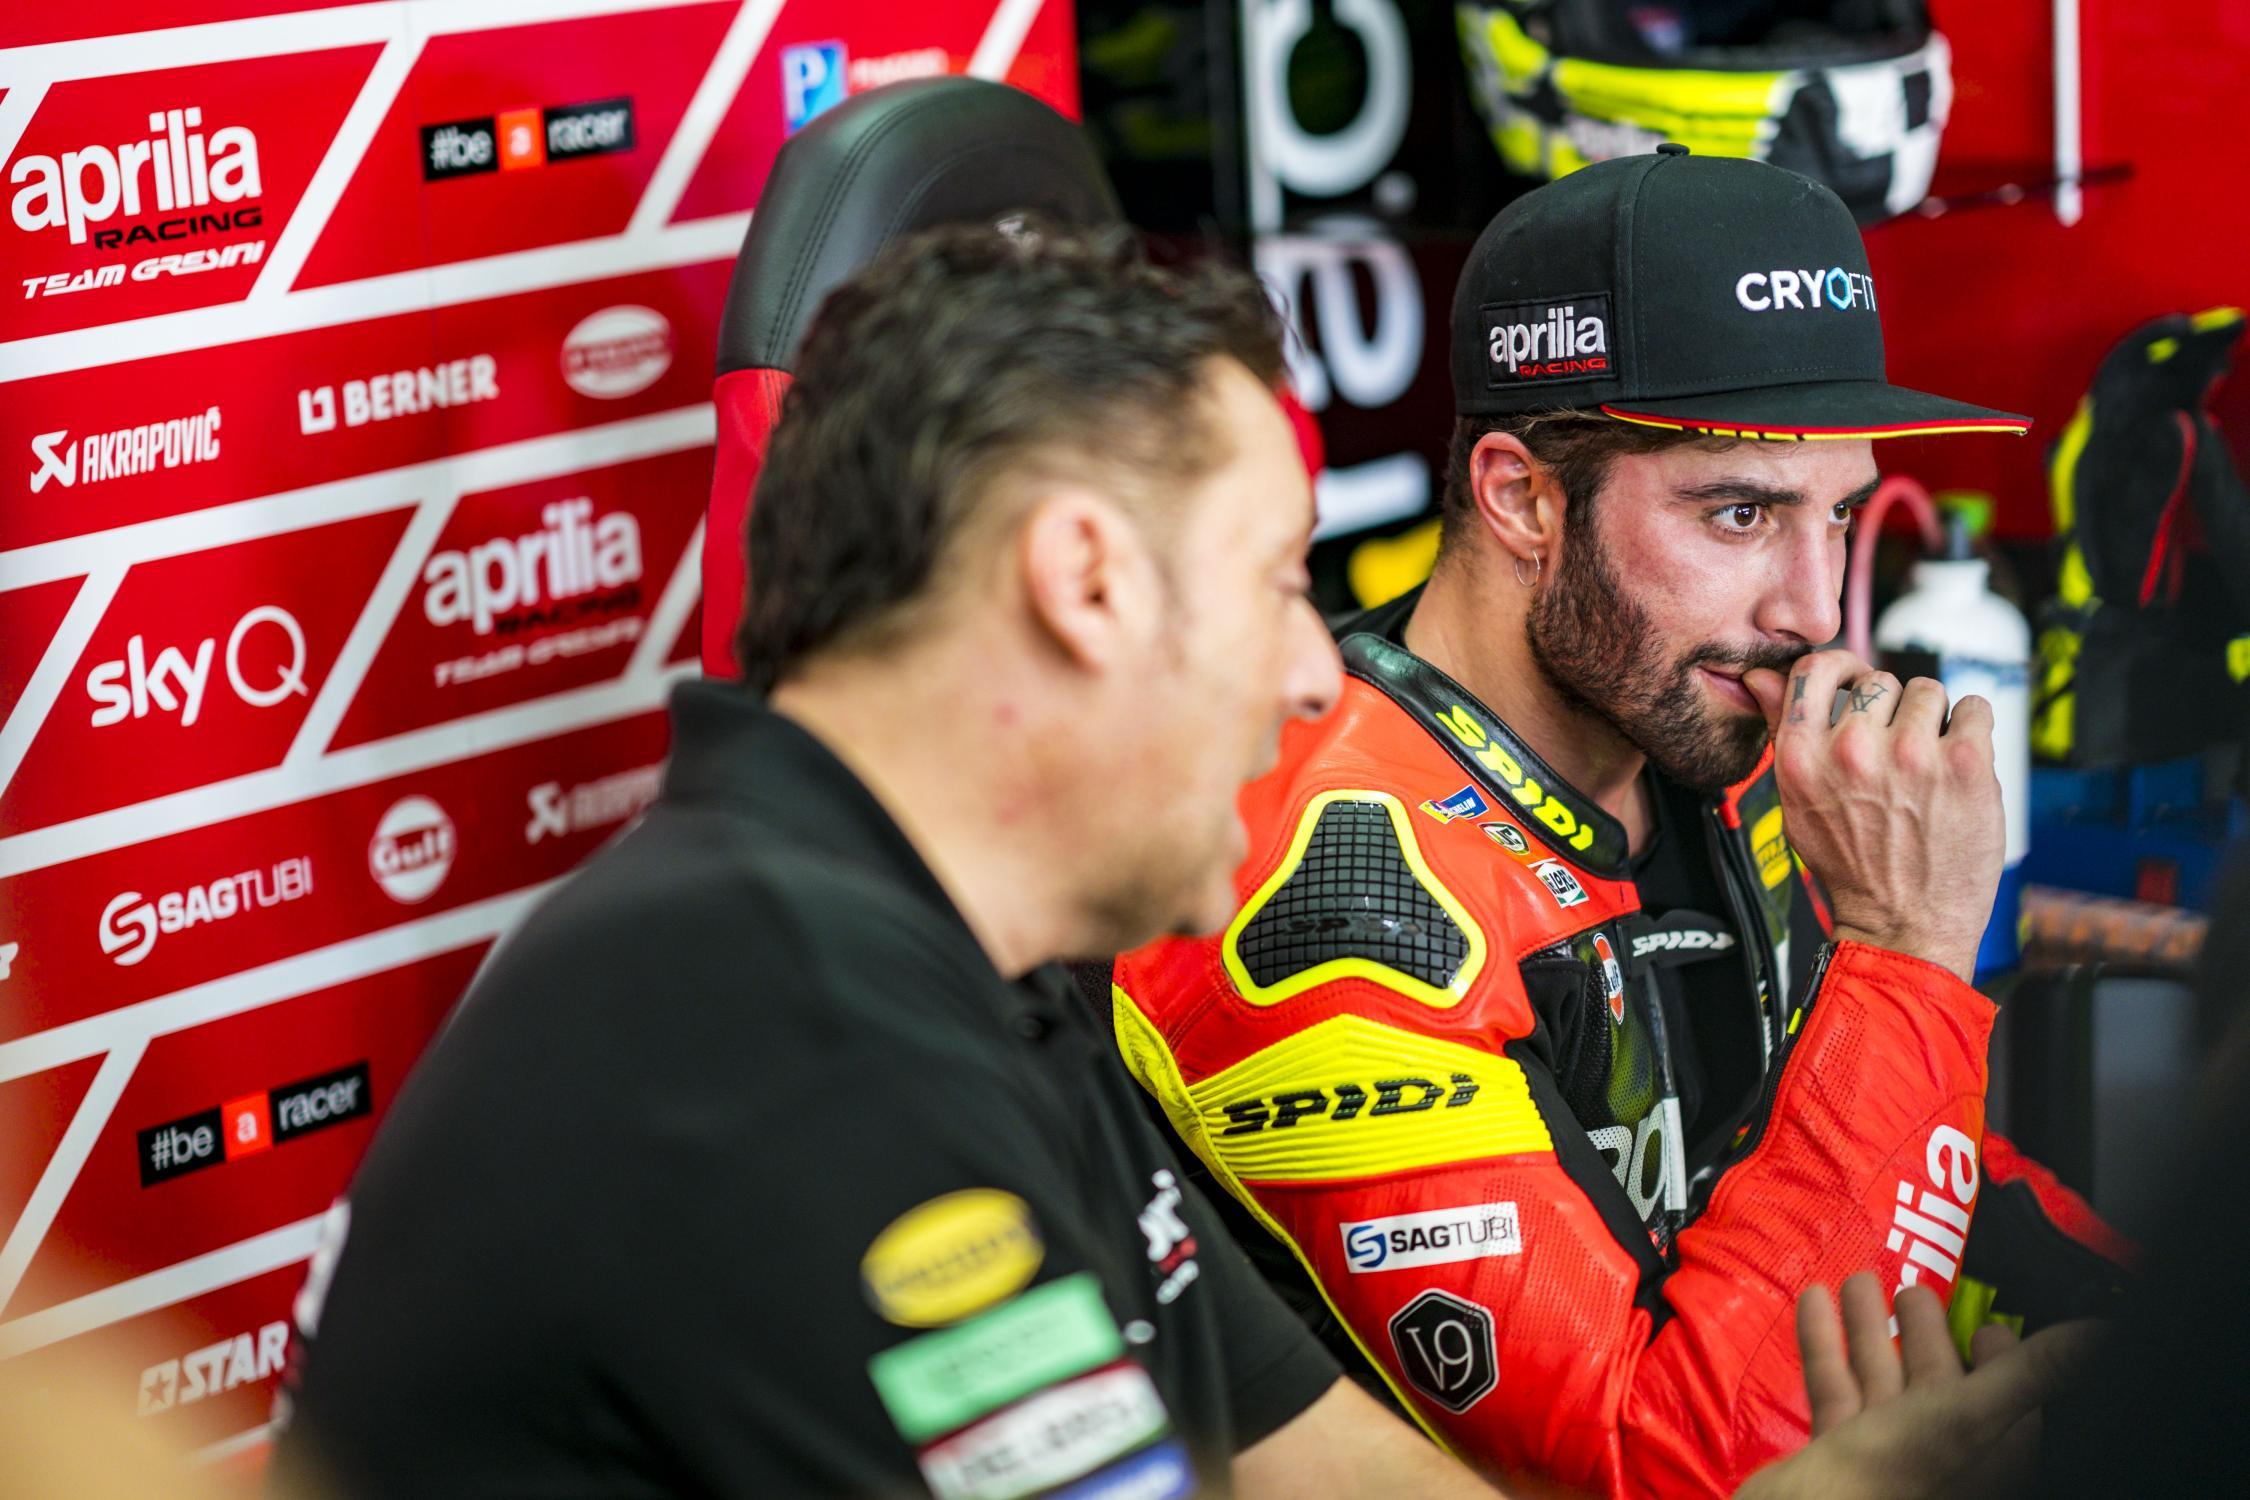 MOTO GP TESTS 2019 - Page 3 Andrea-iannone-sepang-test-motogp-2019-box